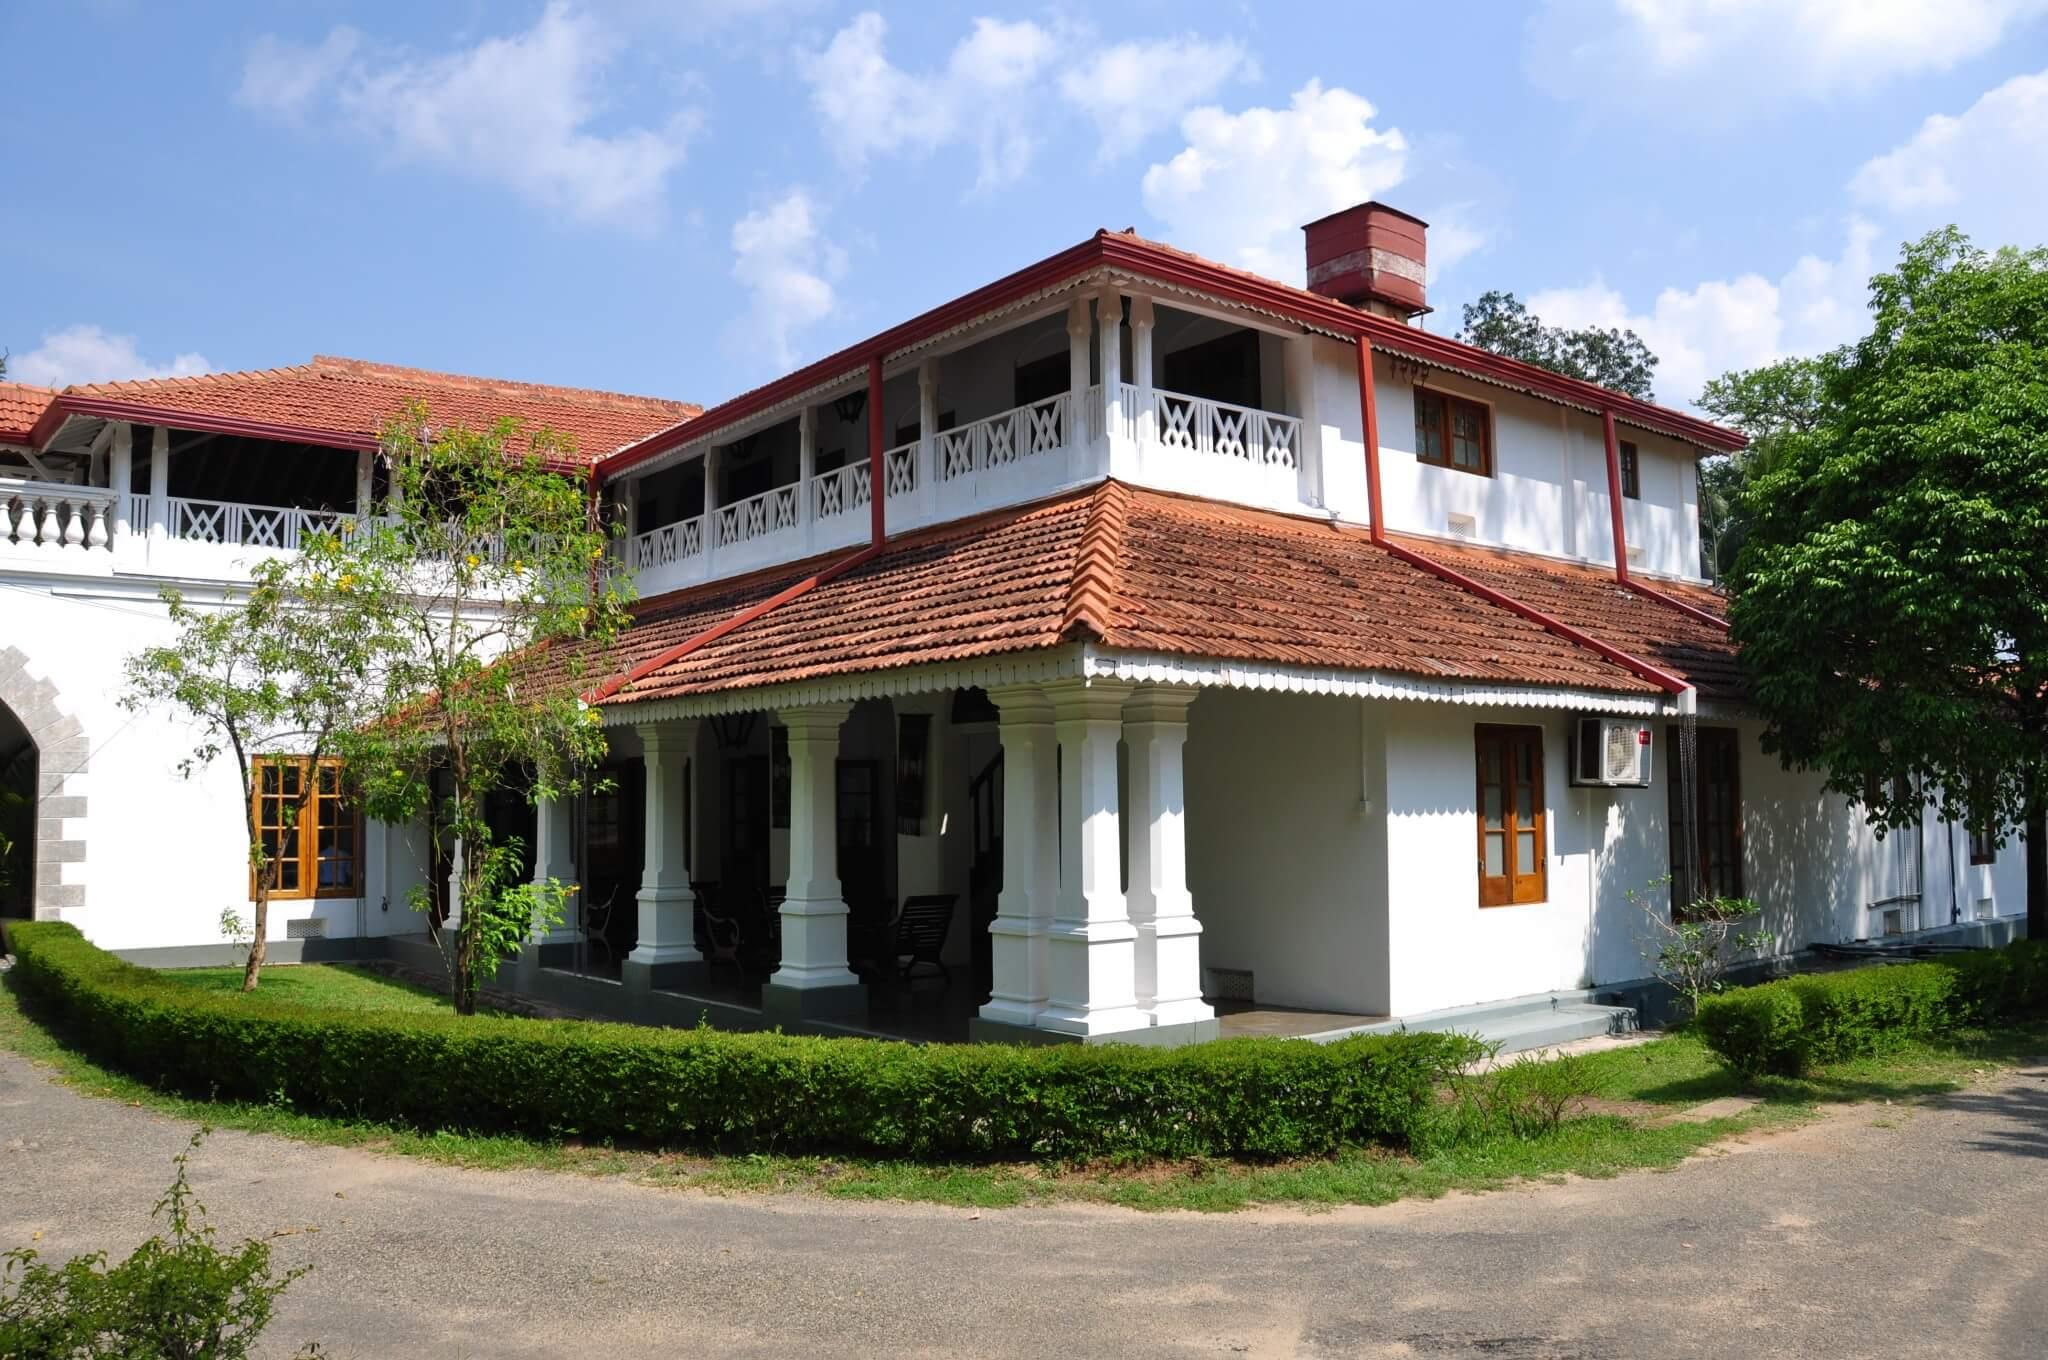 Hoteles en Sri Lanka The Sanctuary at Tissawewa